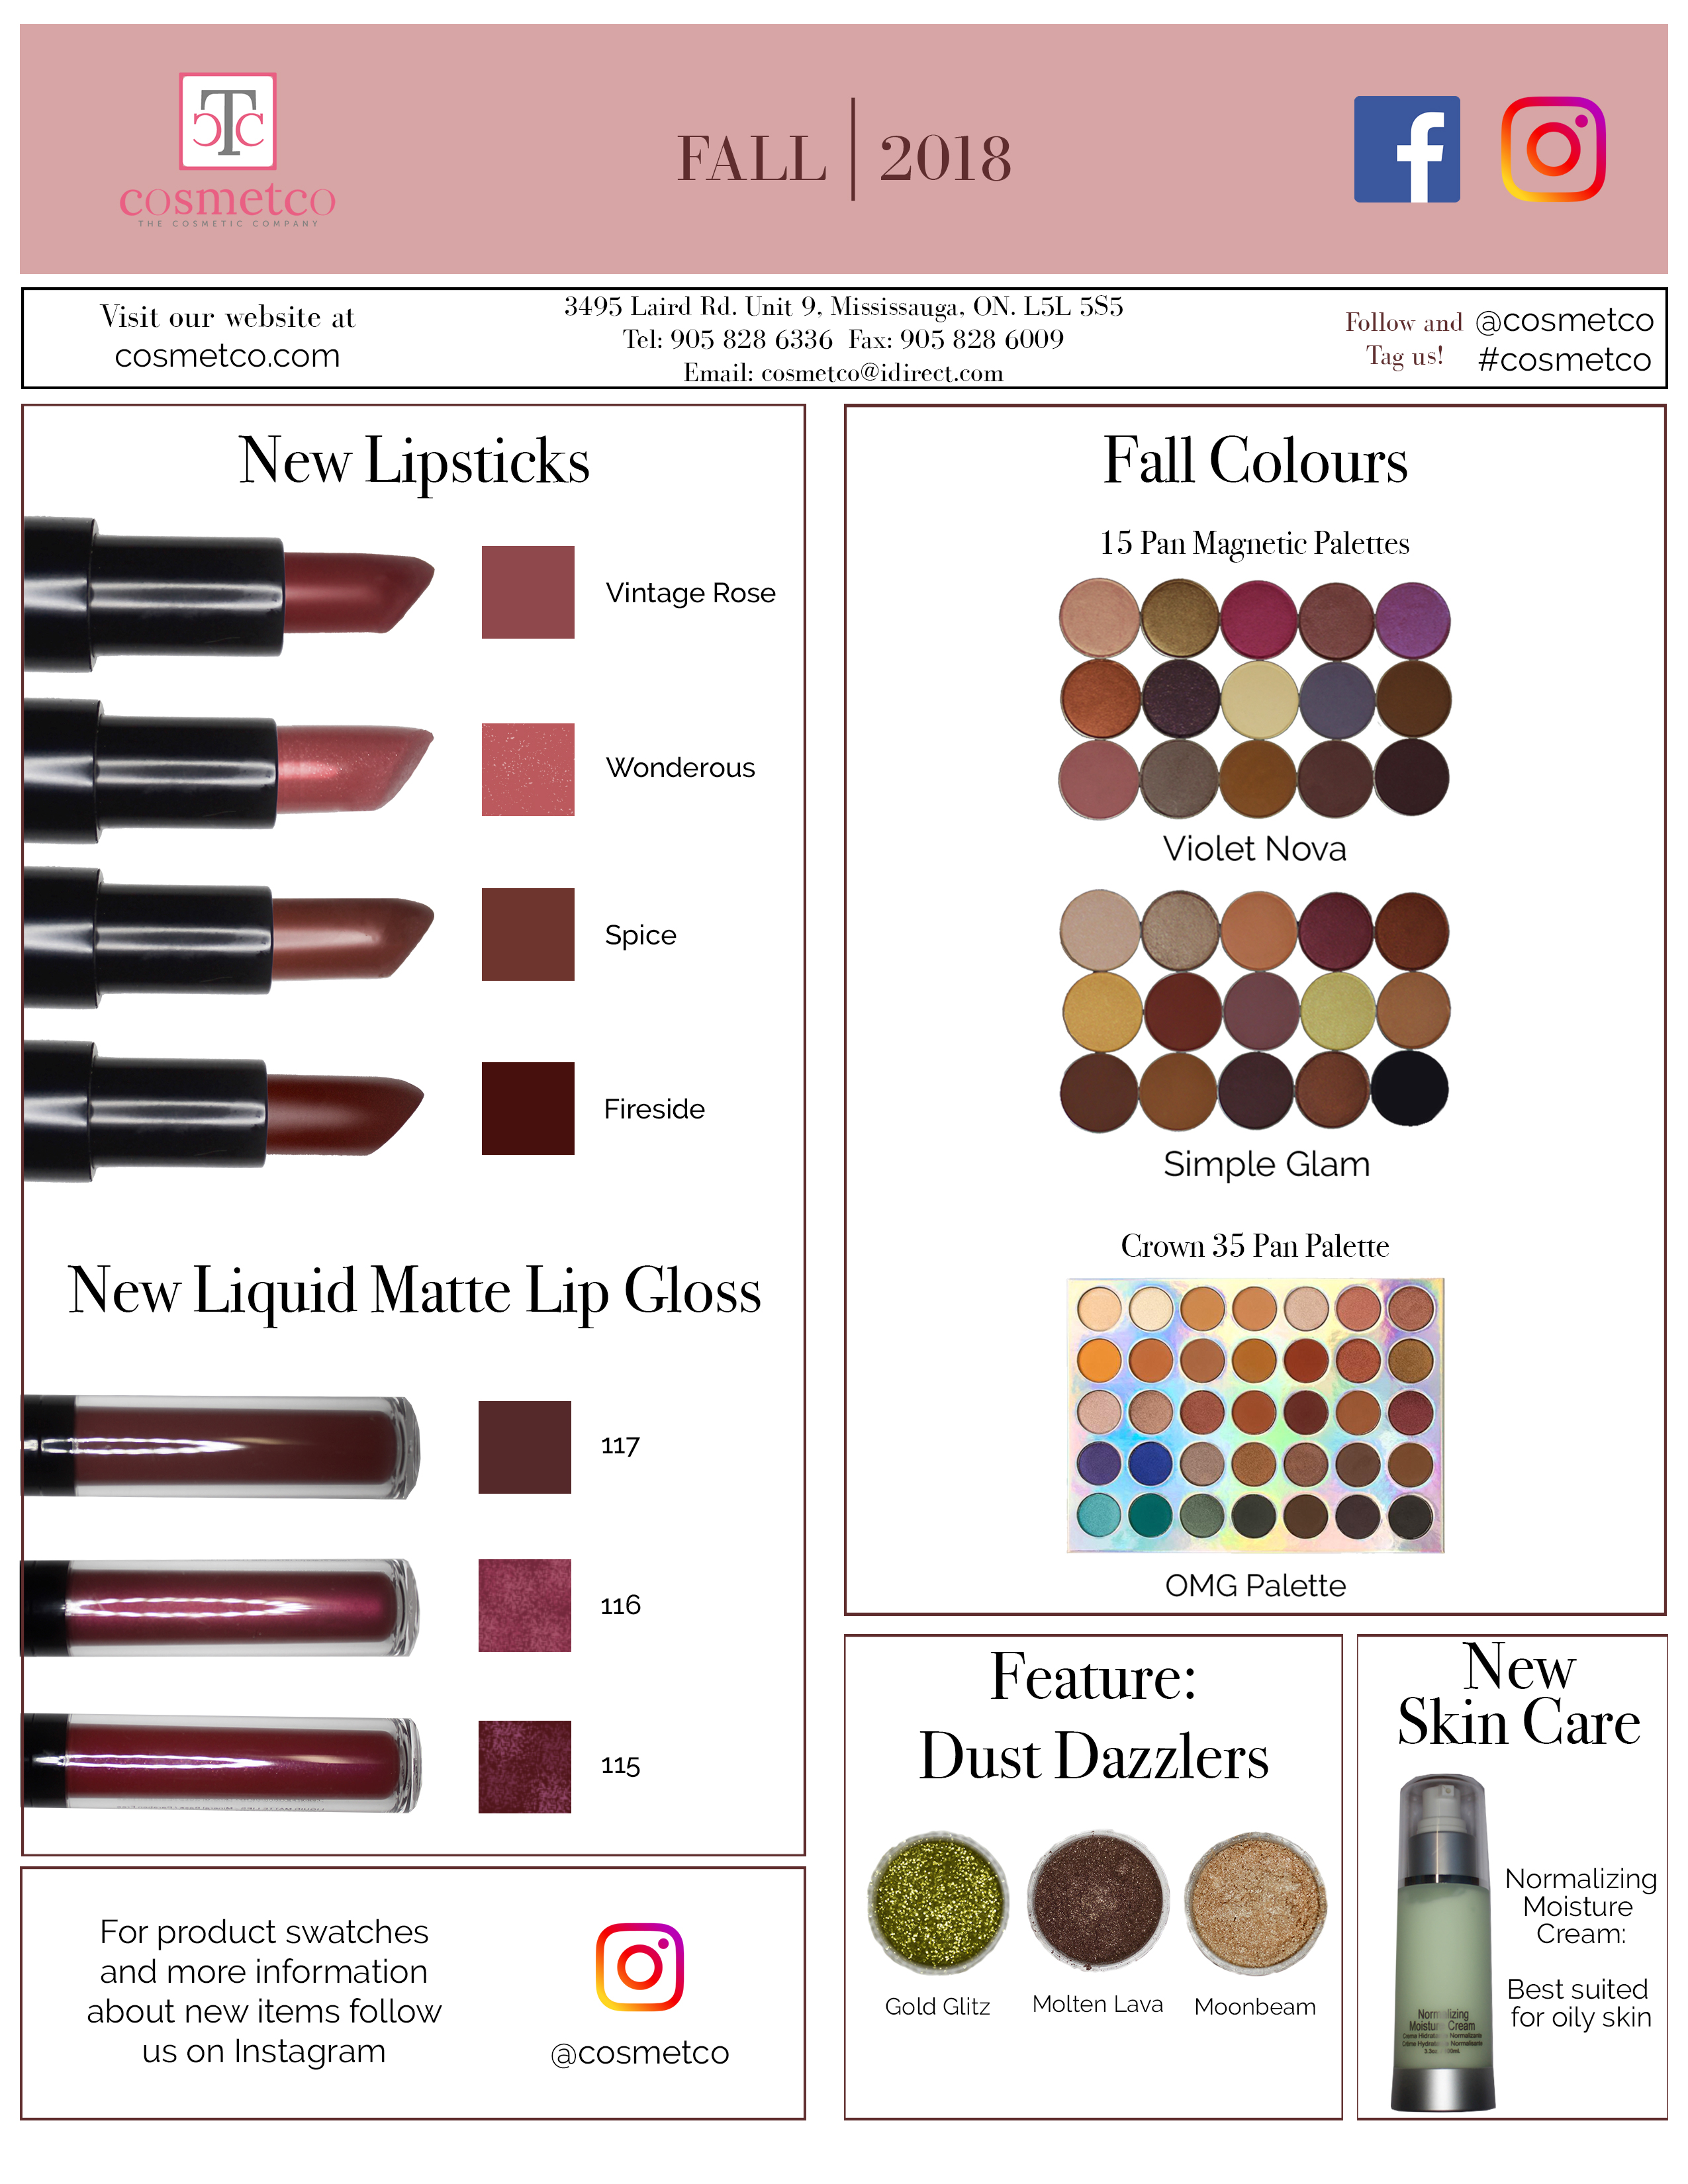 Cosmetco | The Cosmetic Company